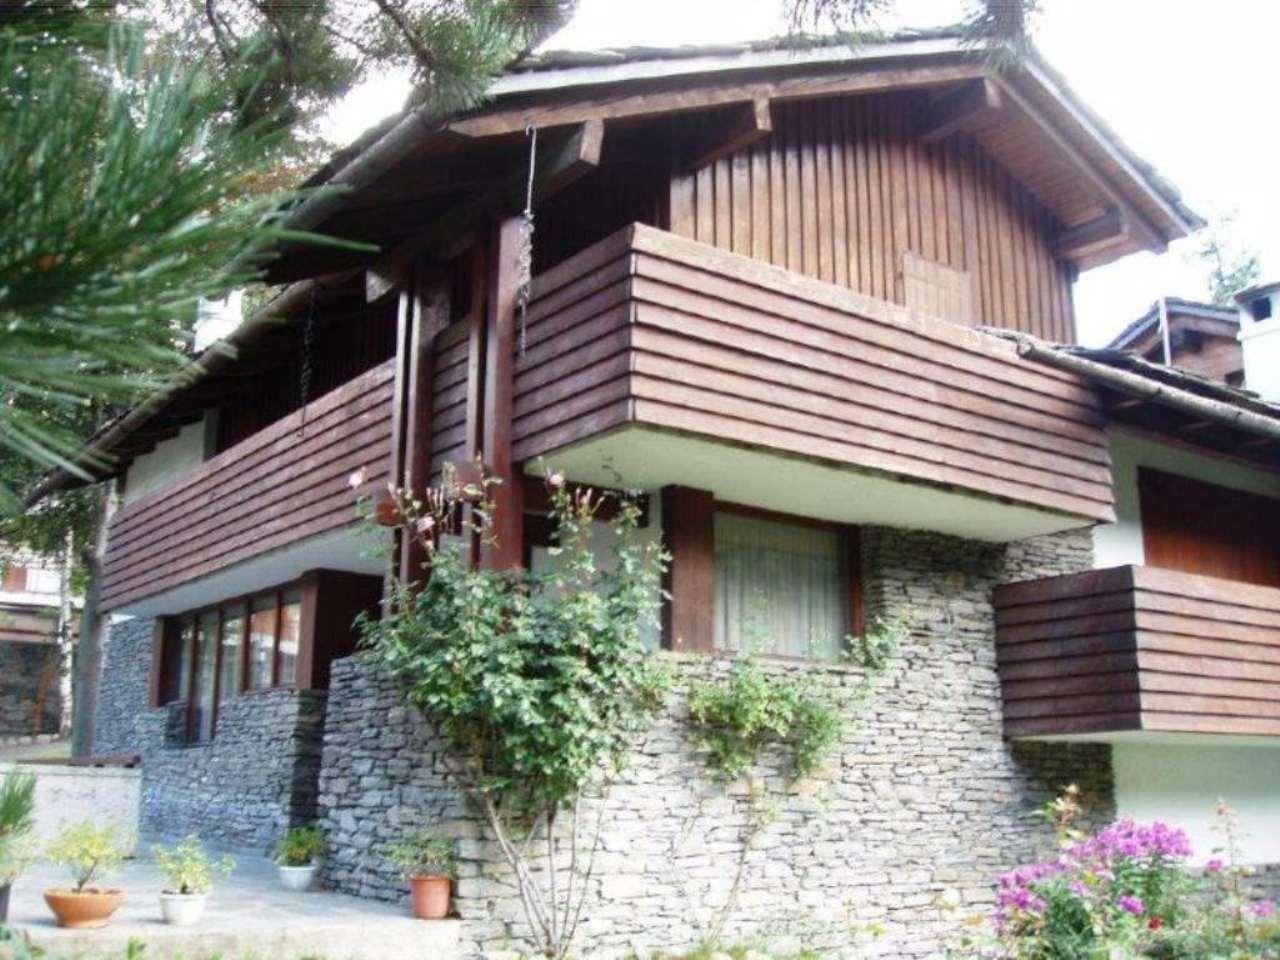 Villa in Vendita a Courmayeur: 5 locali, 220 mq - Foto 4